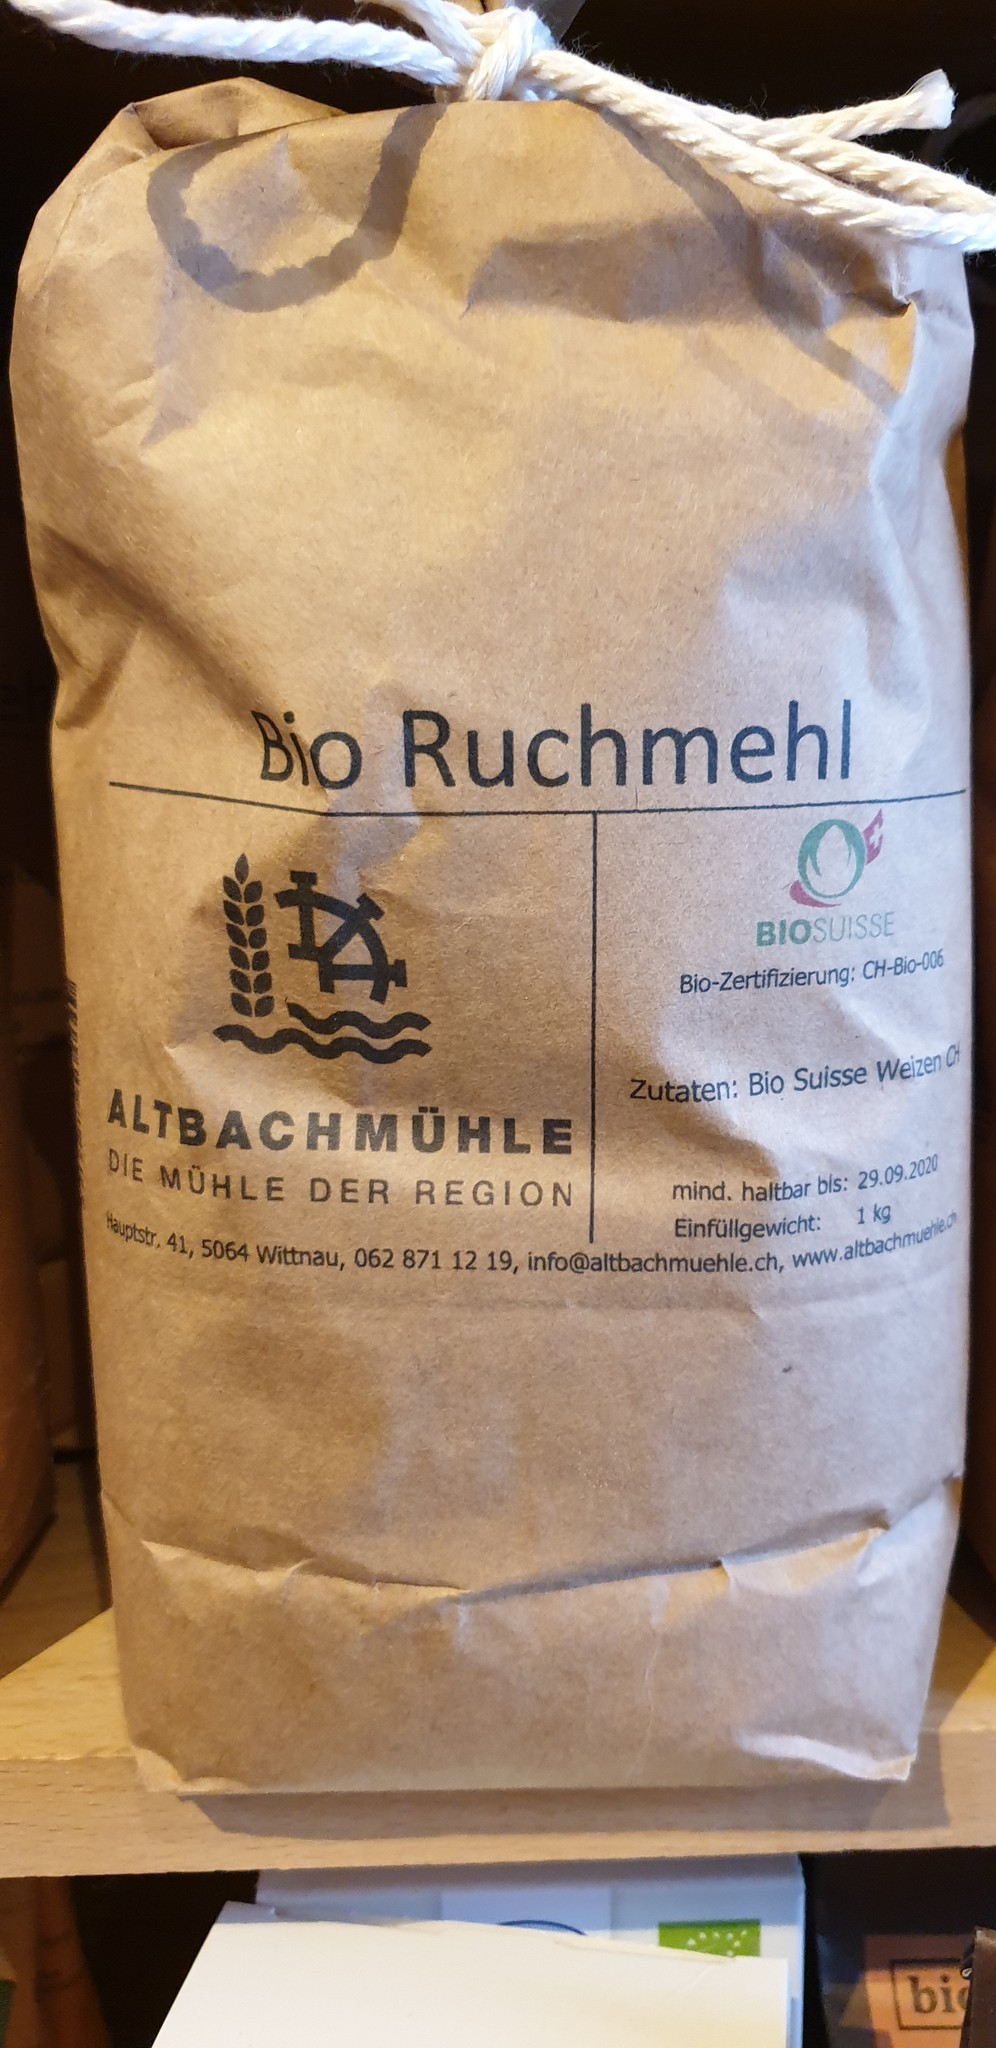 Altbachmühle Ruchmehl bio 1kg Altbachmühle